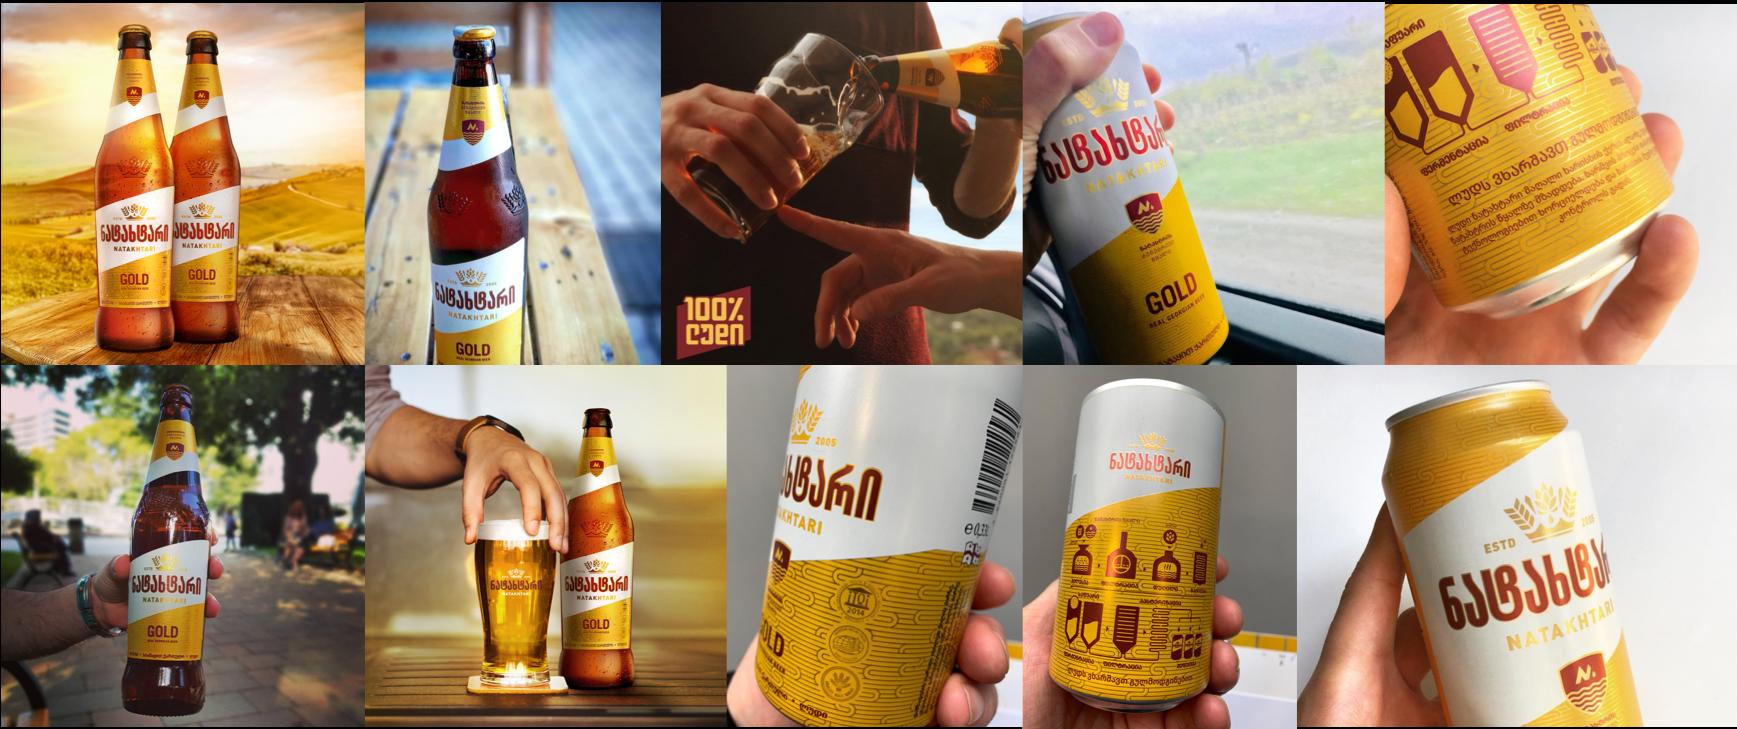 Brown&co - Natakhtari Beer 3.png